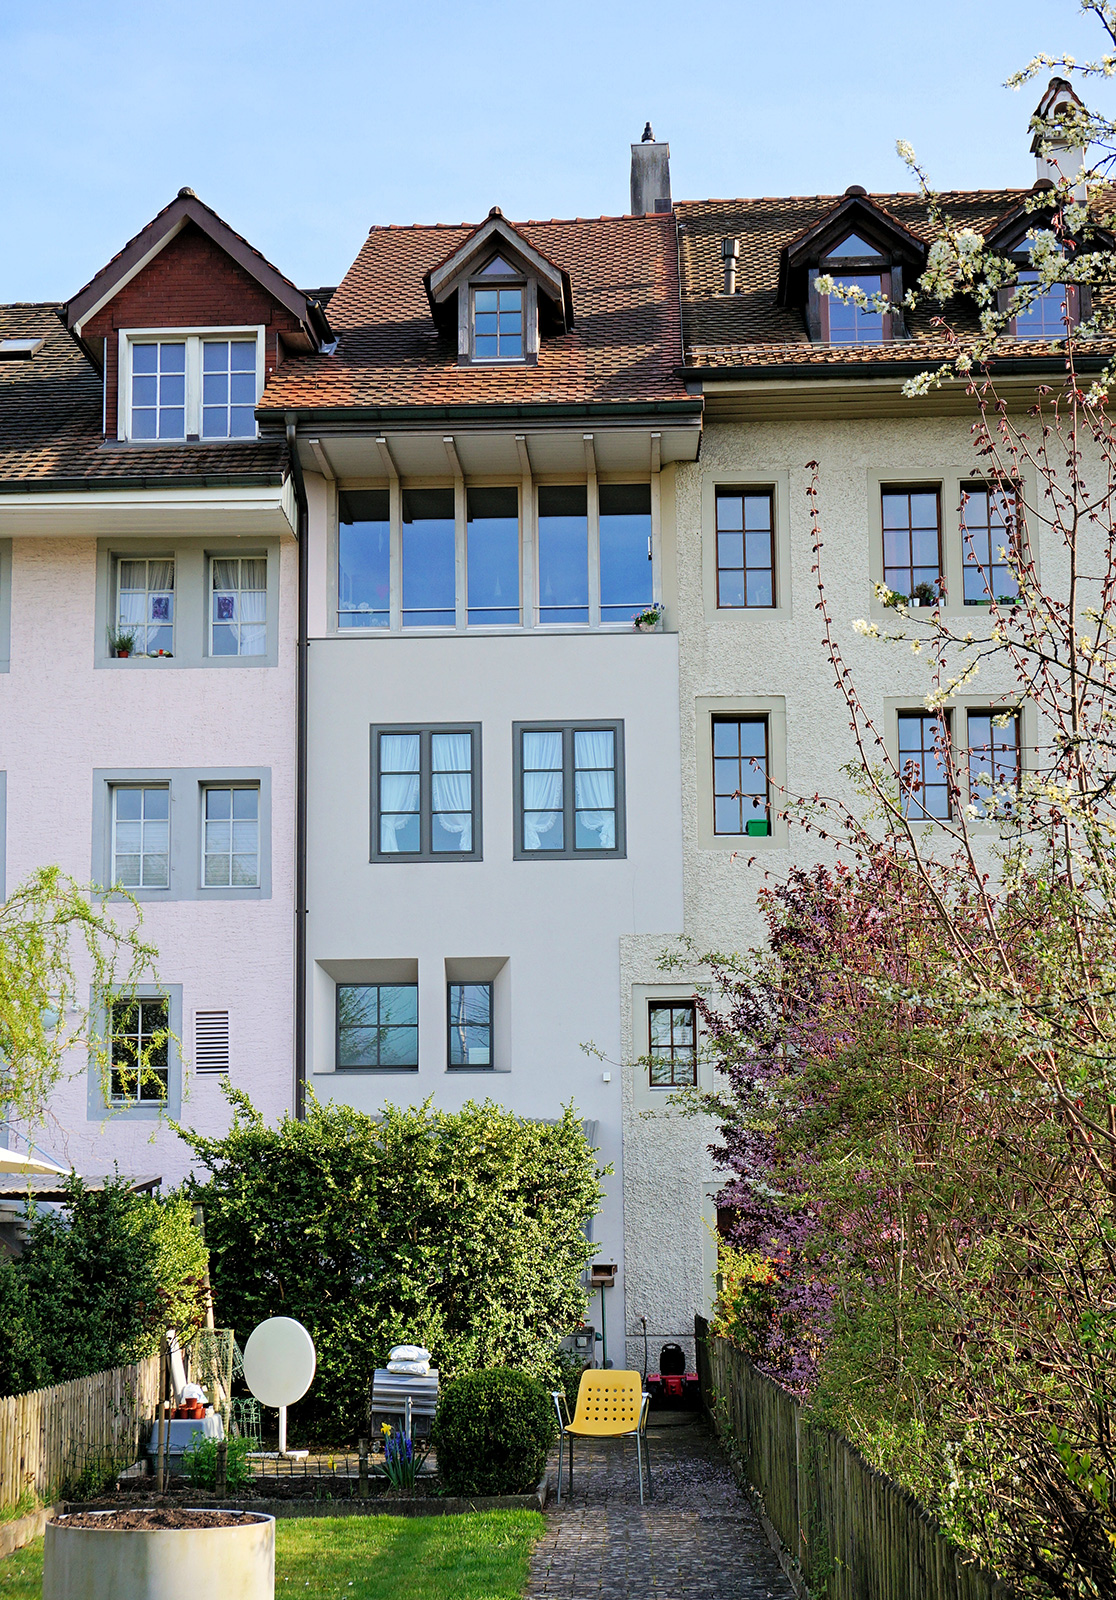 8407 Altstadthaus Bärengasse